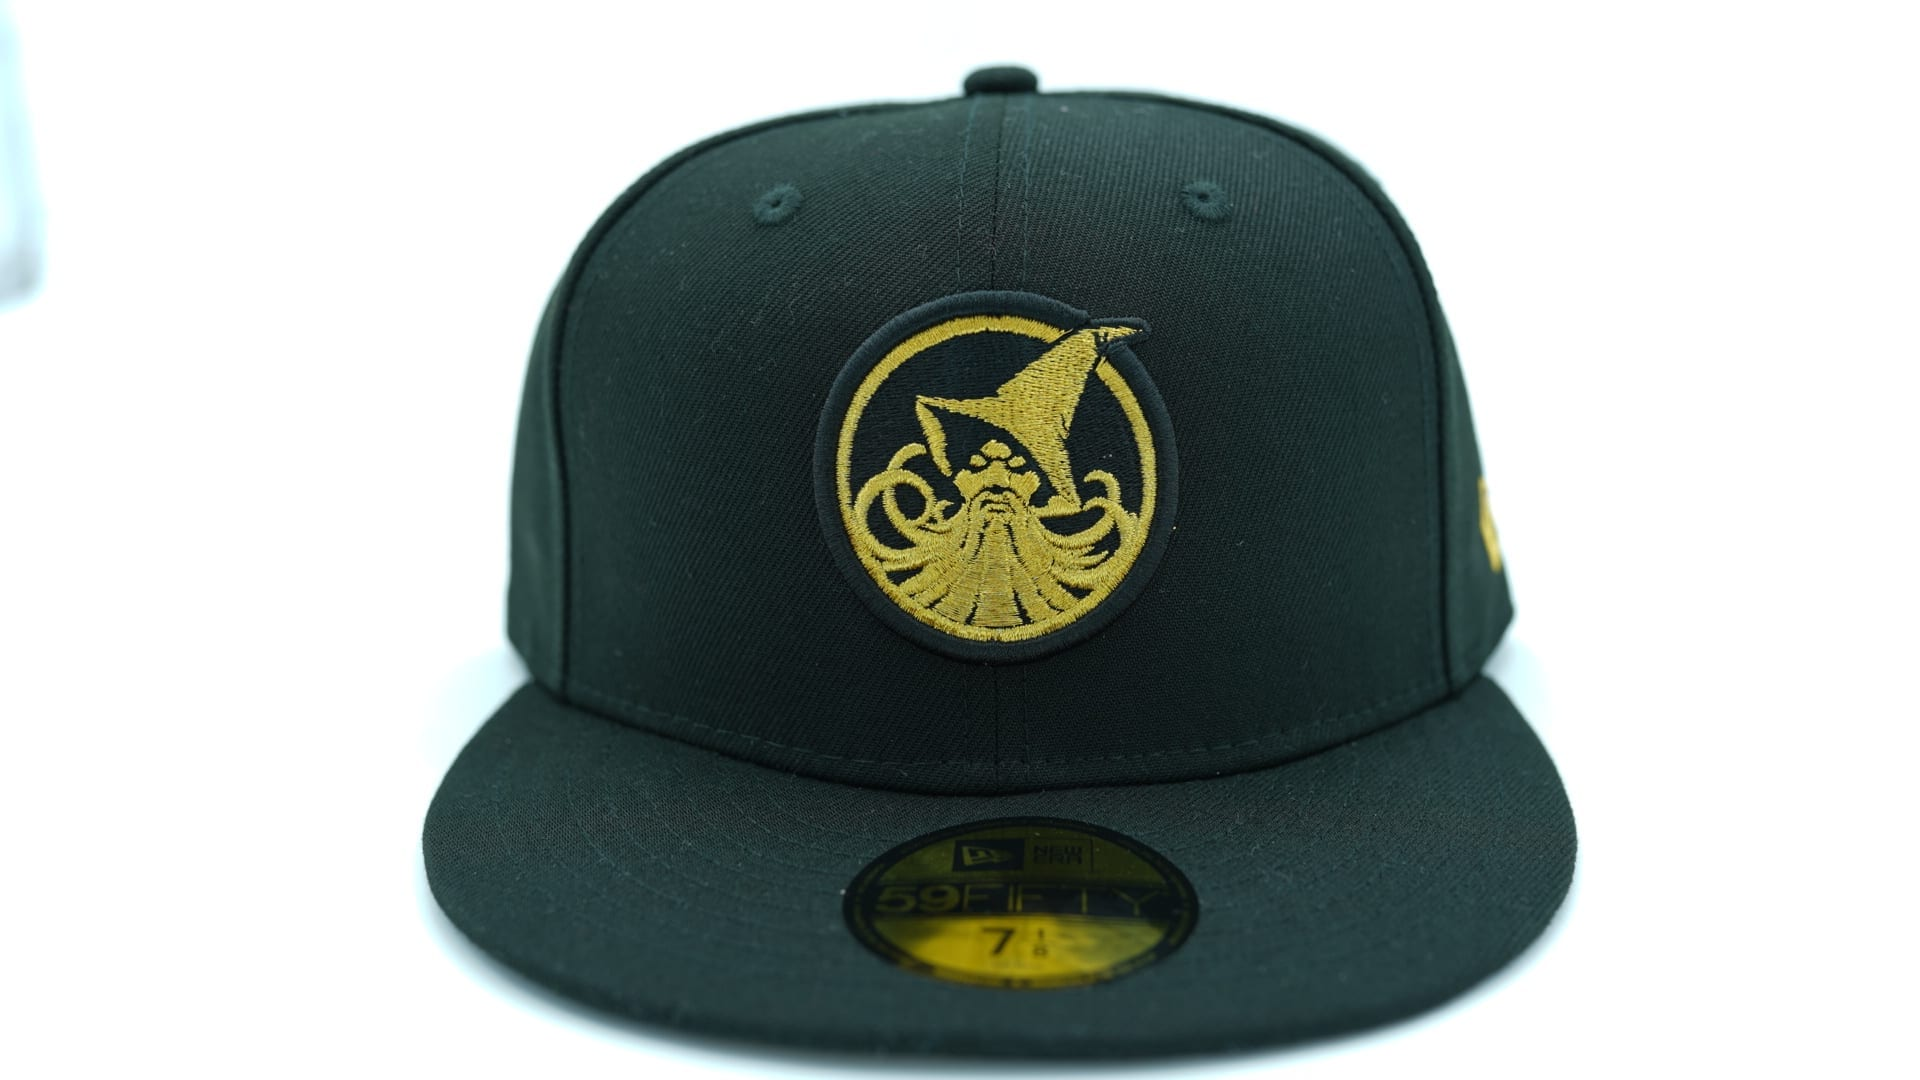 best cheap 4b708 4cfdb ... discount georgetown hoyas fitted new era 59fifty baseball cap1 9ed89  c4522